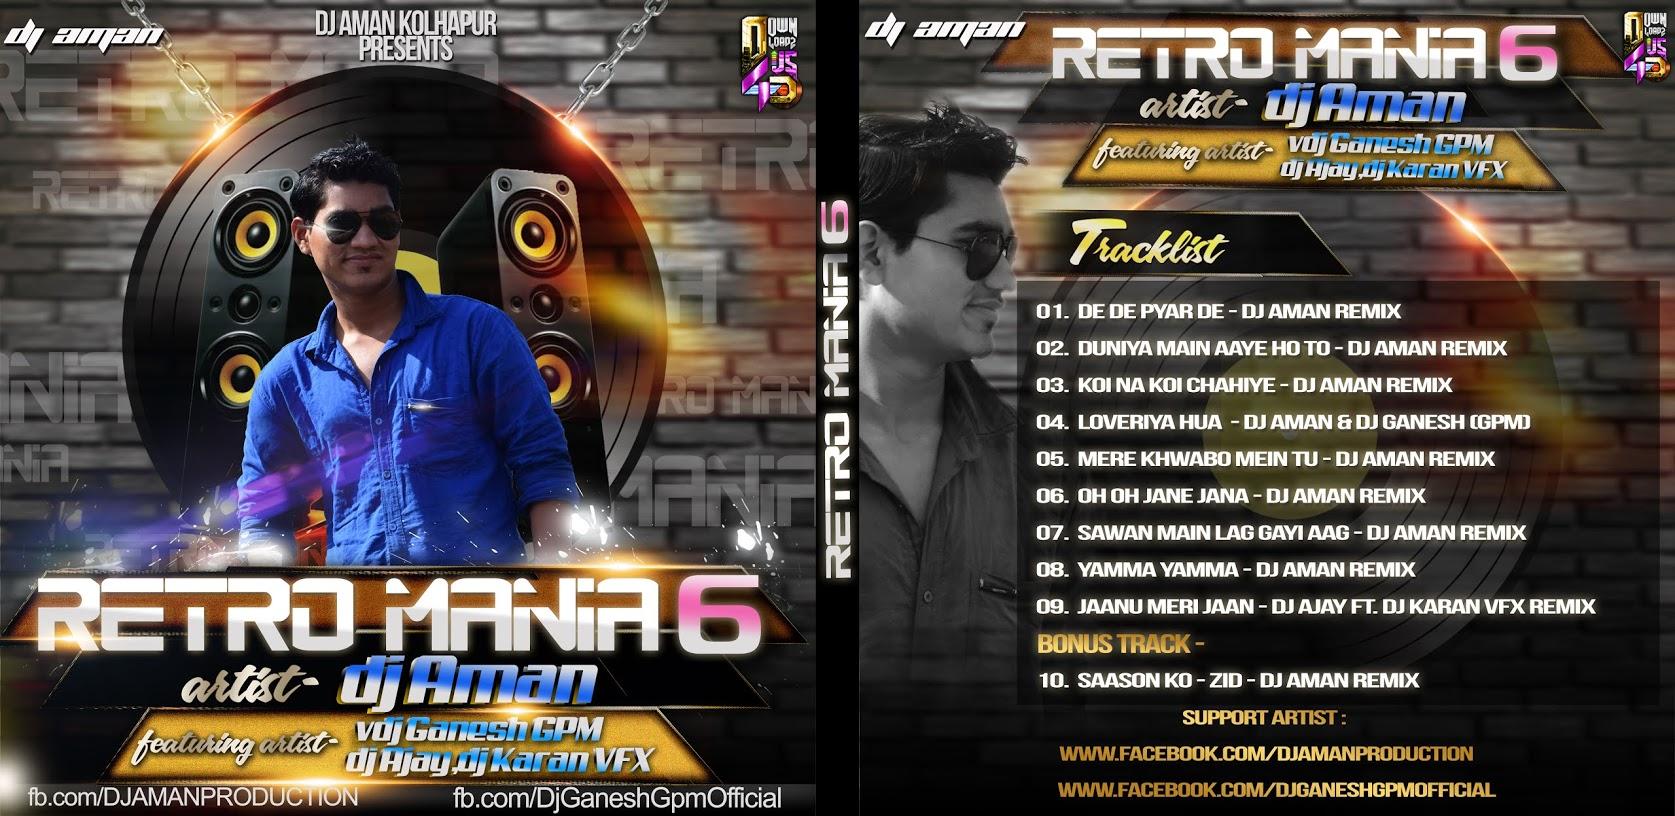 Retro Mania Vol.6 - DJ Aman